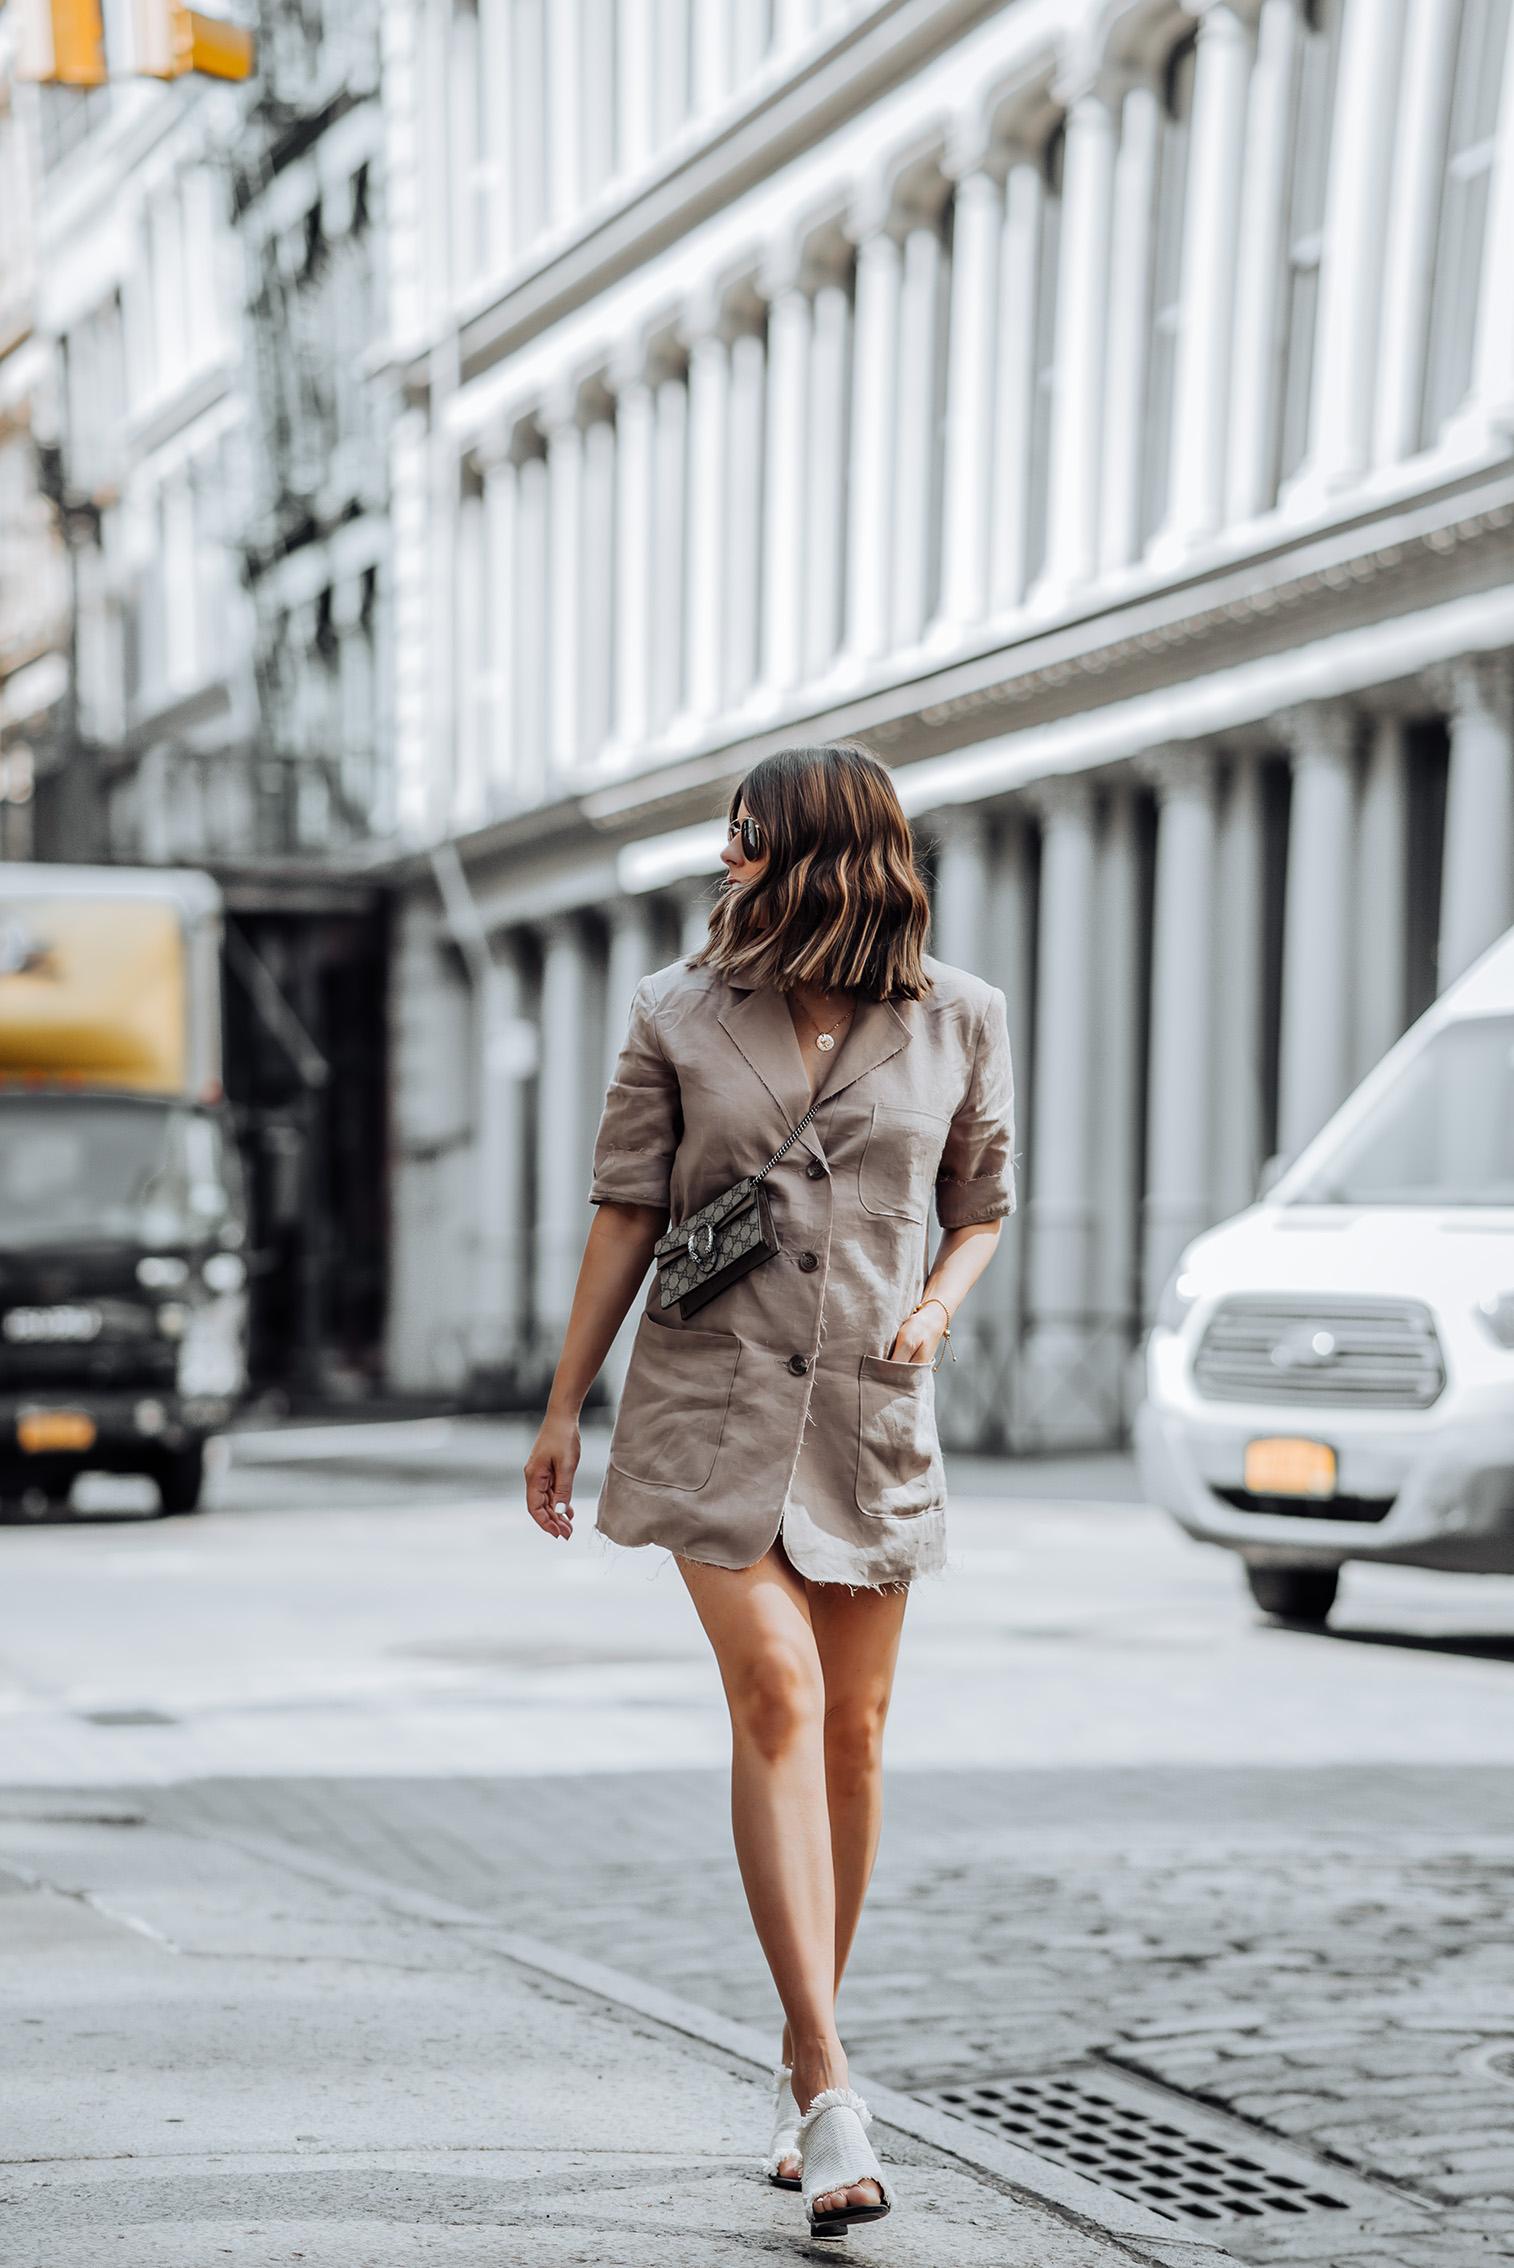 Oversized Blazer via Storets   Heels (obsessed! Runs TTS)   Gucci mini bag  #liketkit #rewardstyle #ootd #oversizedblazer #blazeroutfits #NYCblog #guccidionysus #storets #streetstyle